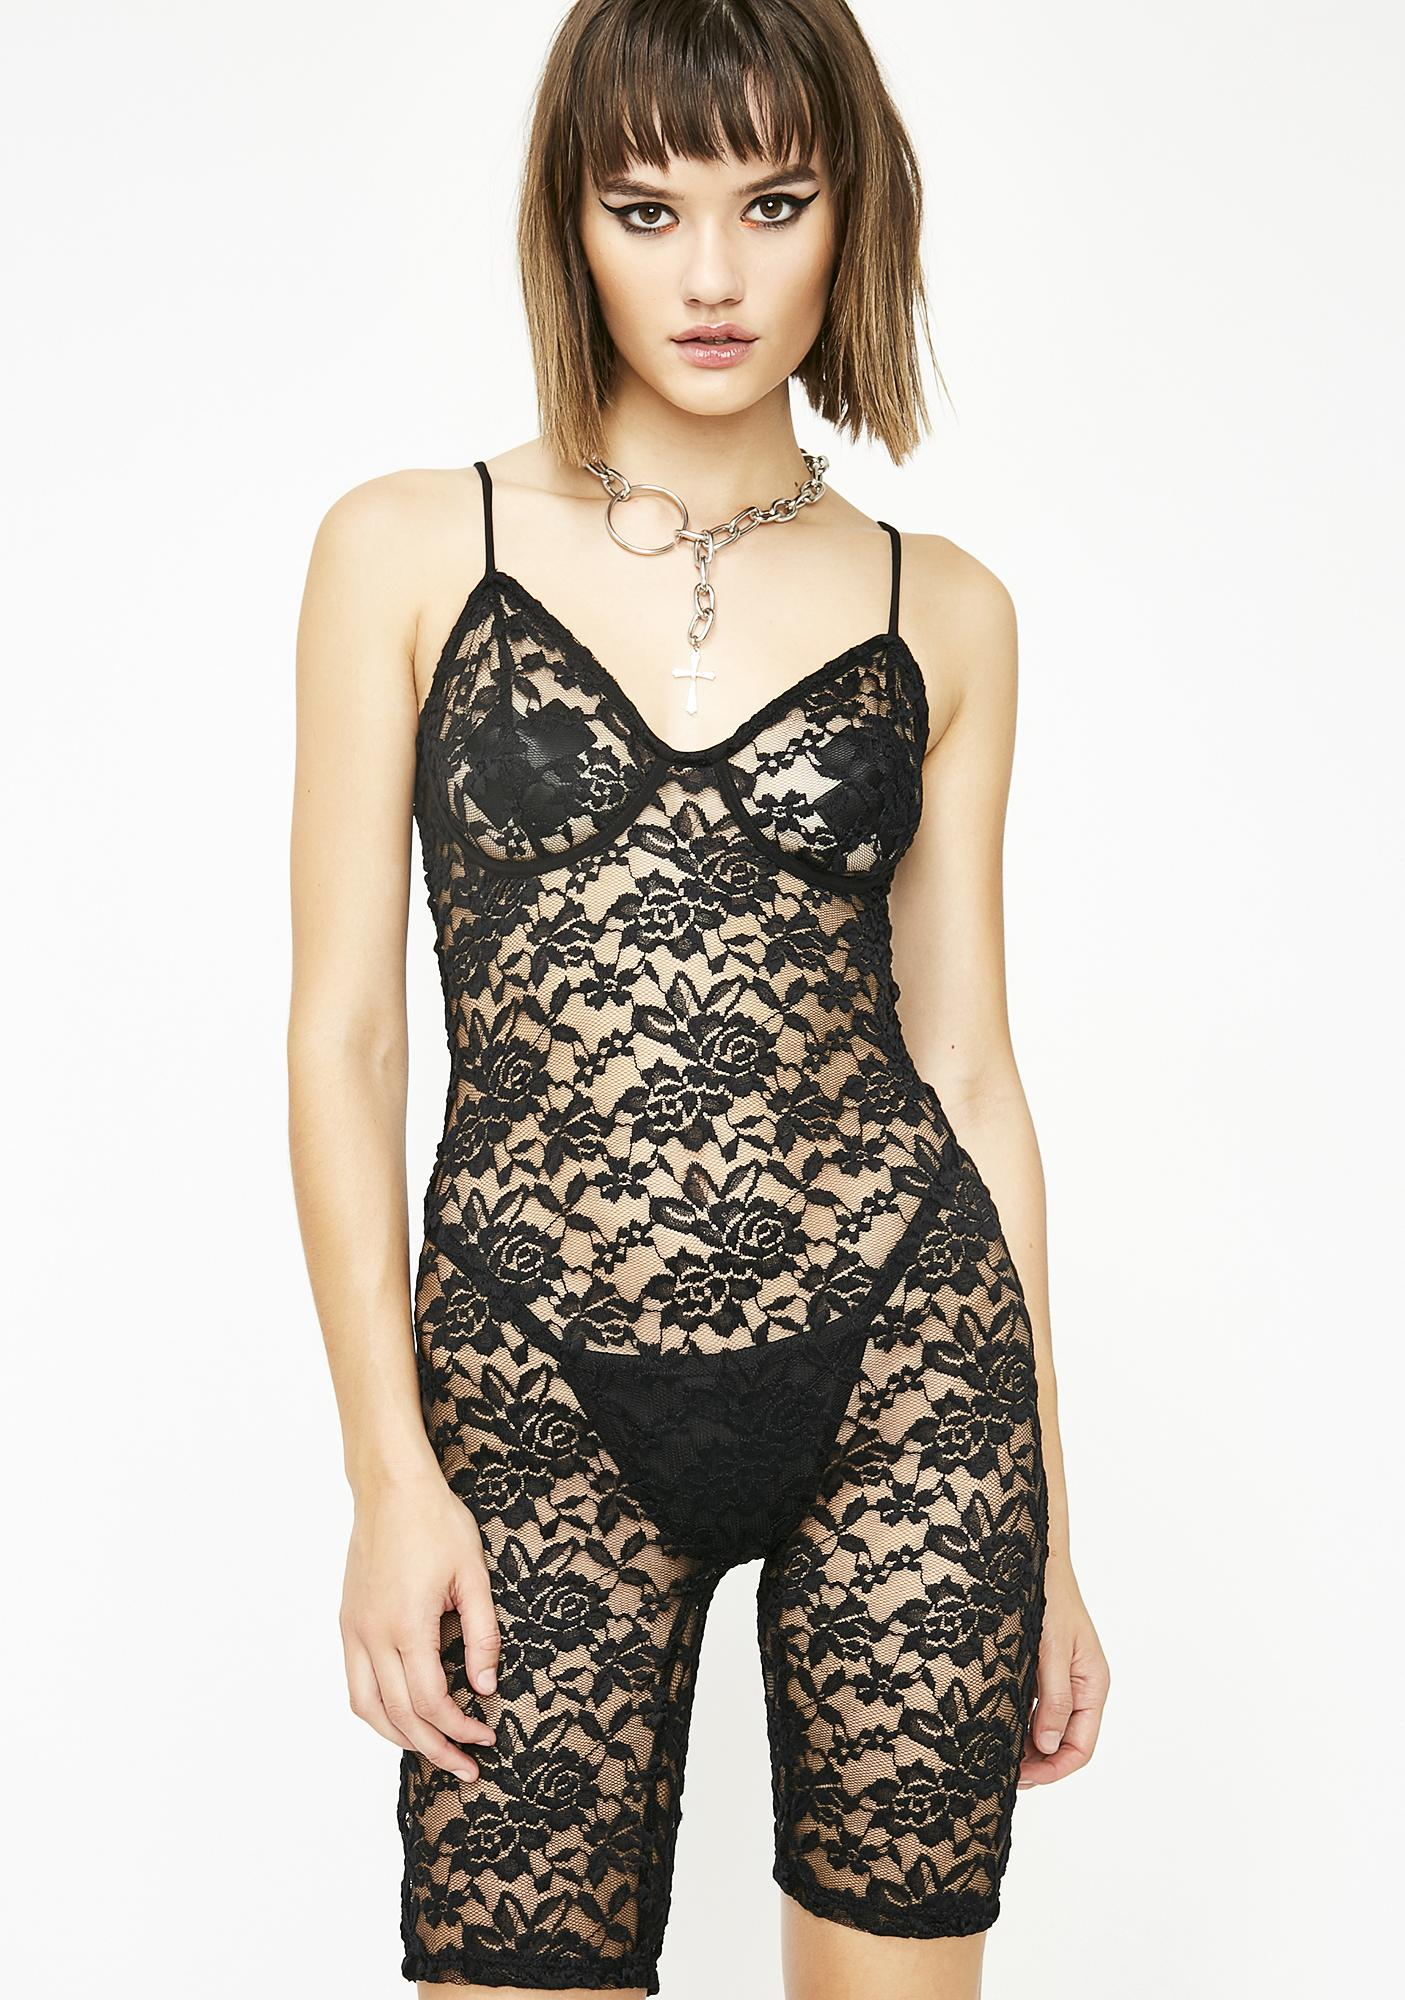 Sinful Neon Seduction Lace Romper